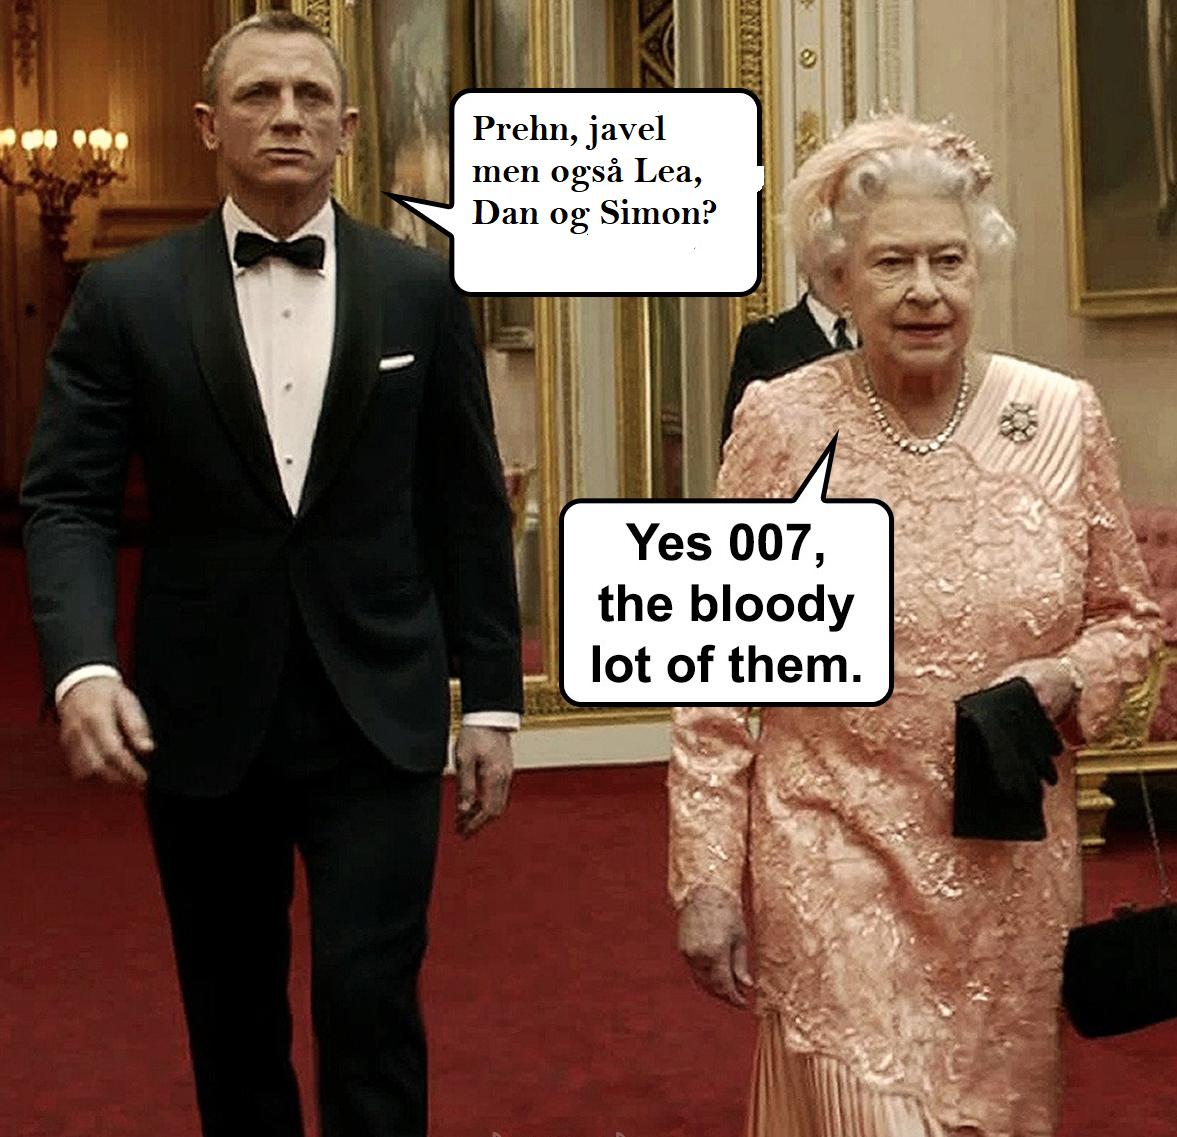 James Bond Prehn m.fl.